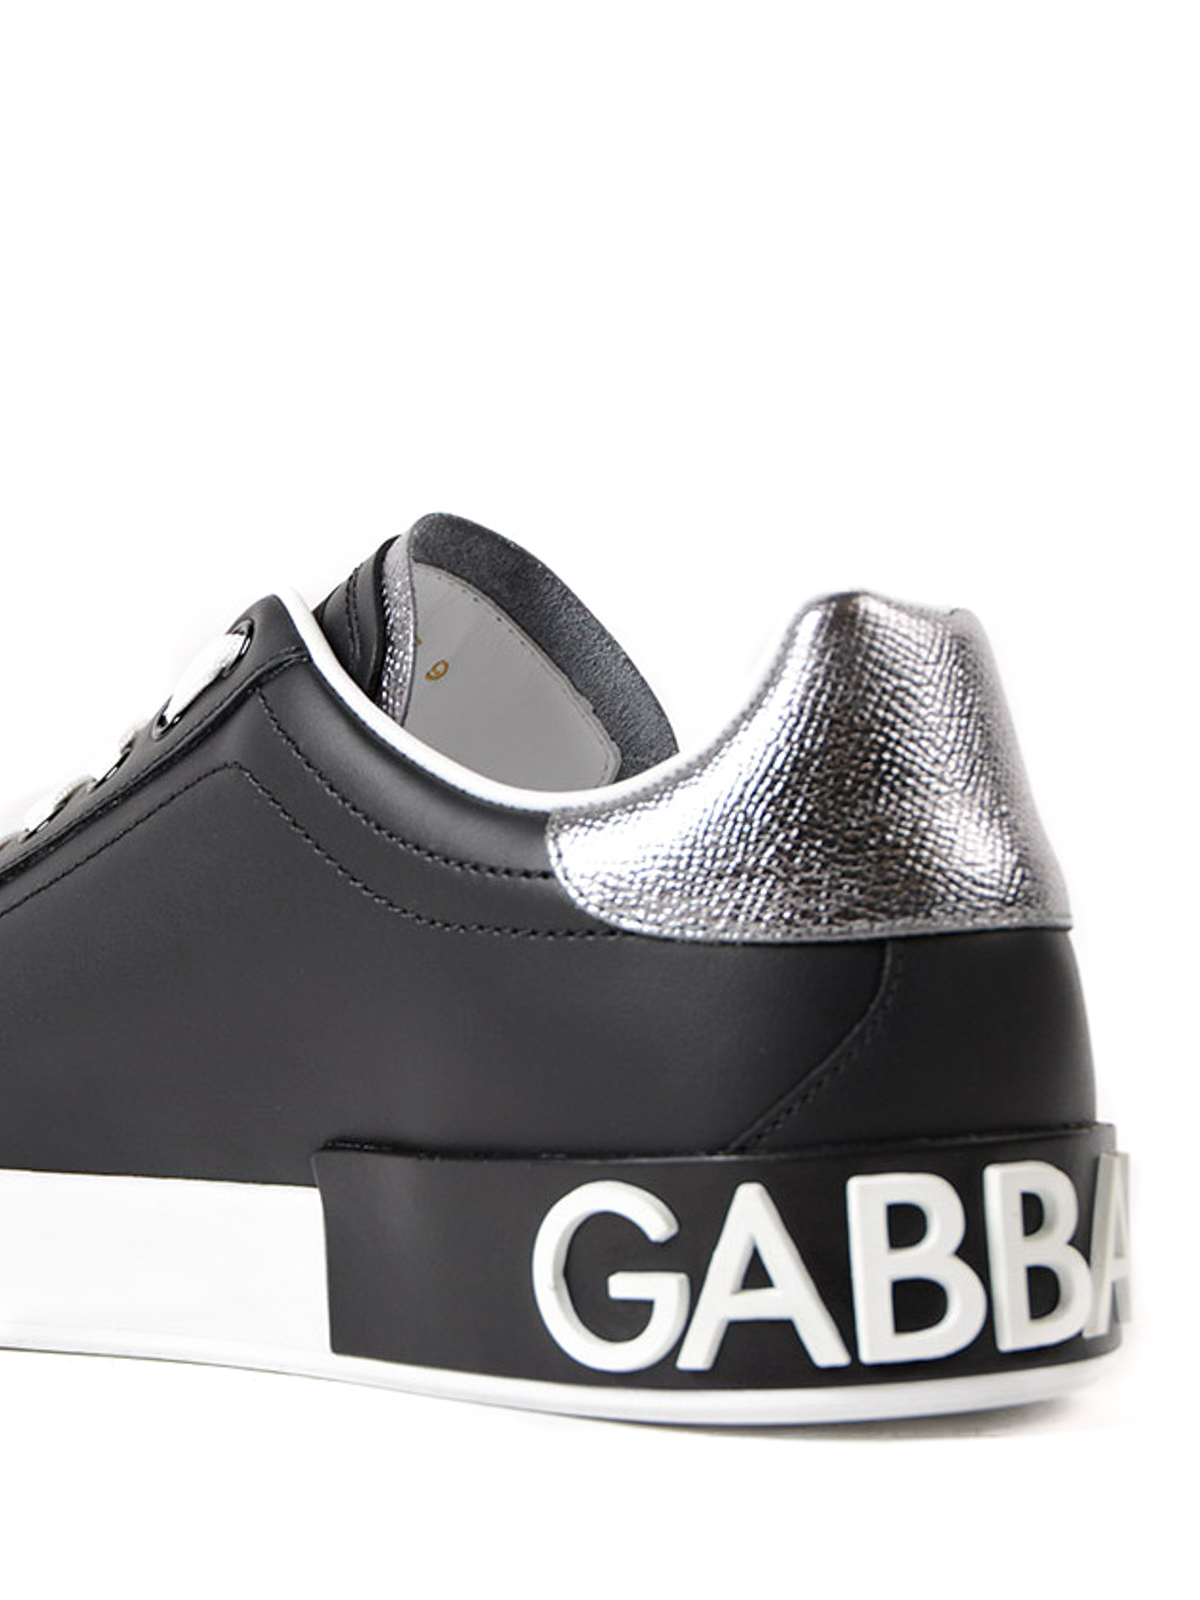 Portofino black calfskin sneakers